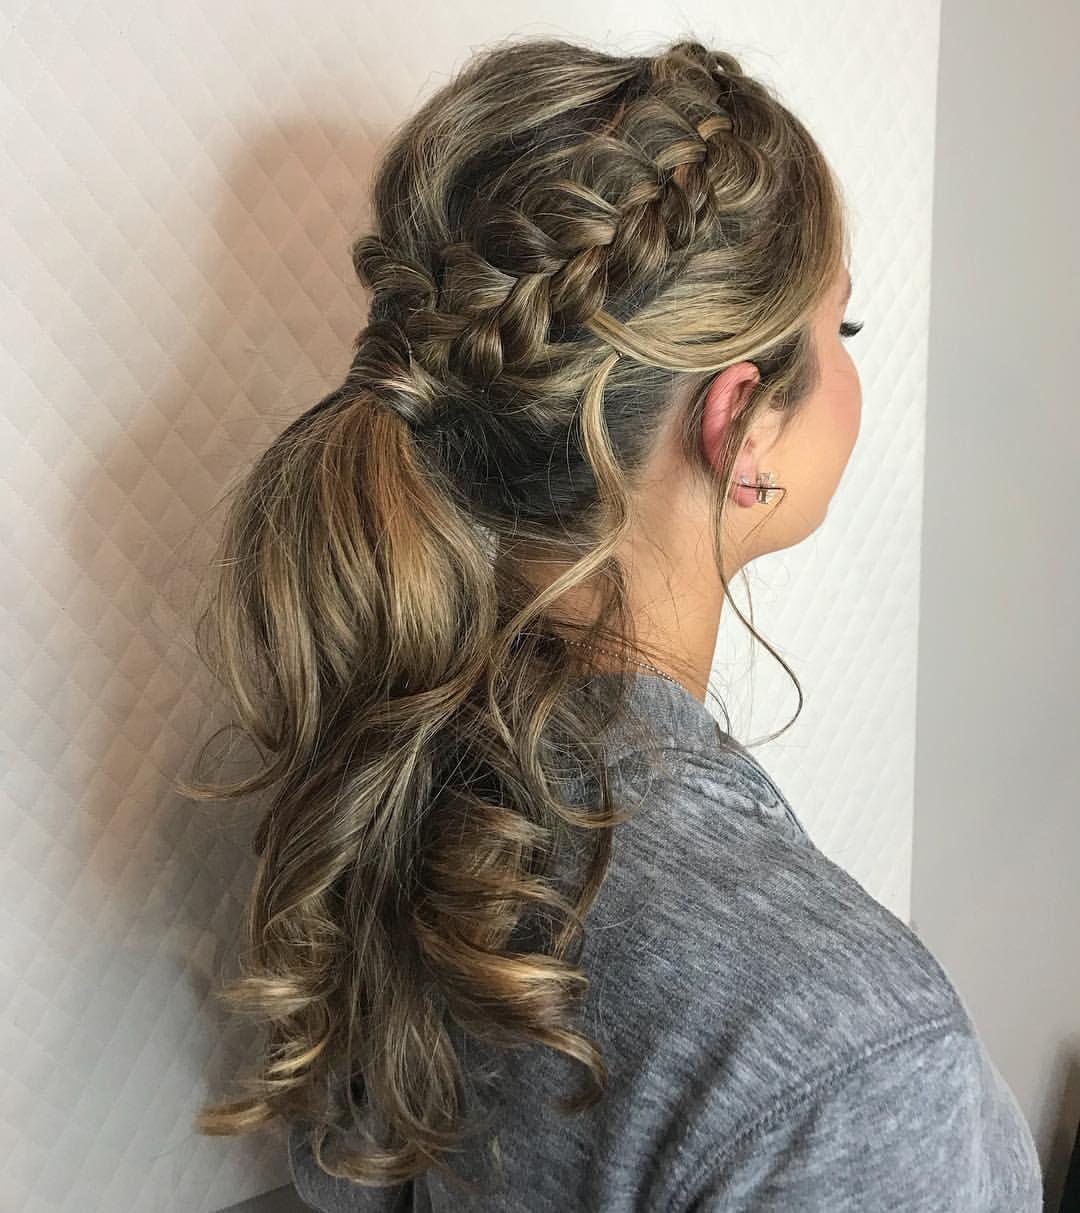 Prom ponytail! #ponytail #promhair #updo #dutchbraid ...